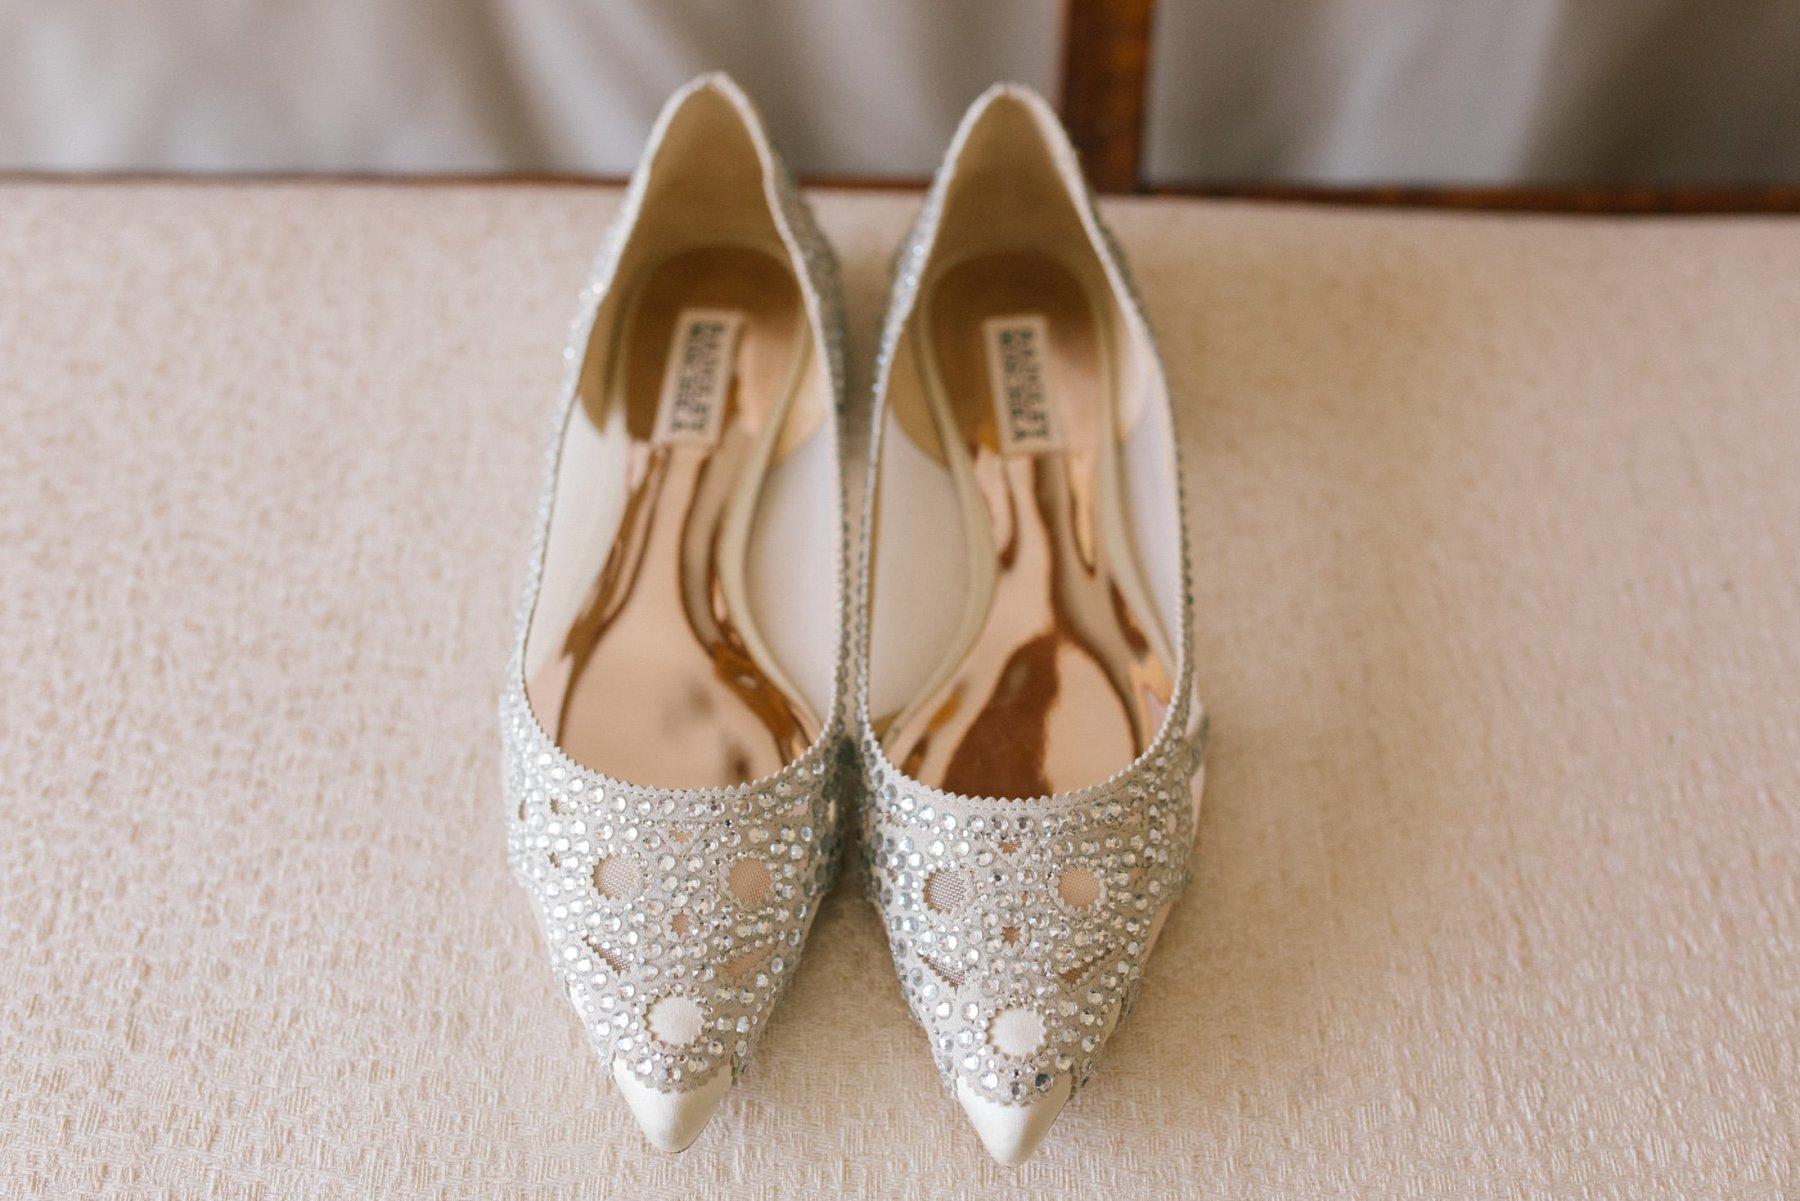 Badgley Mischka Gigi flats wedding shoes Arizona wedding